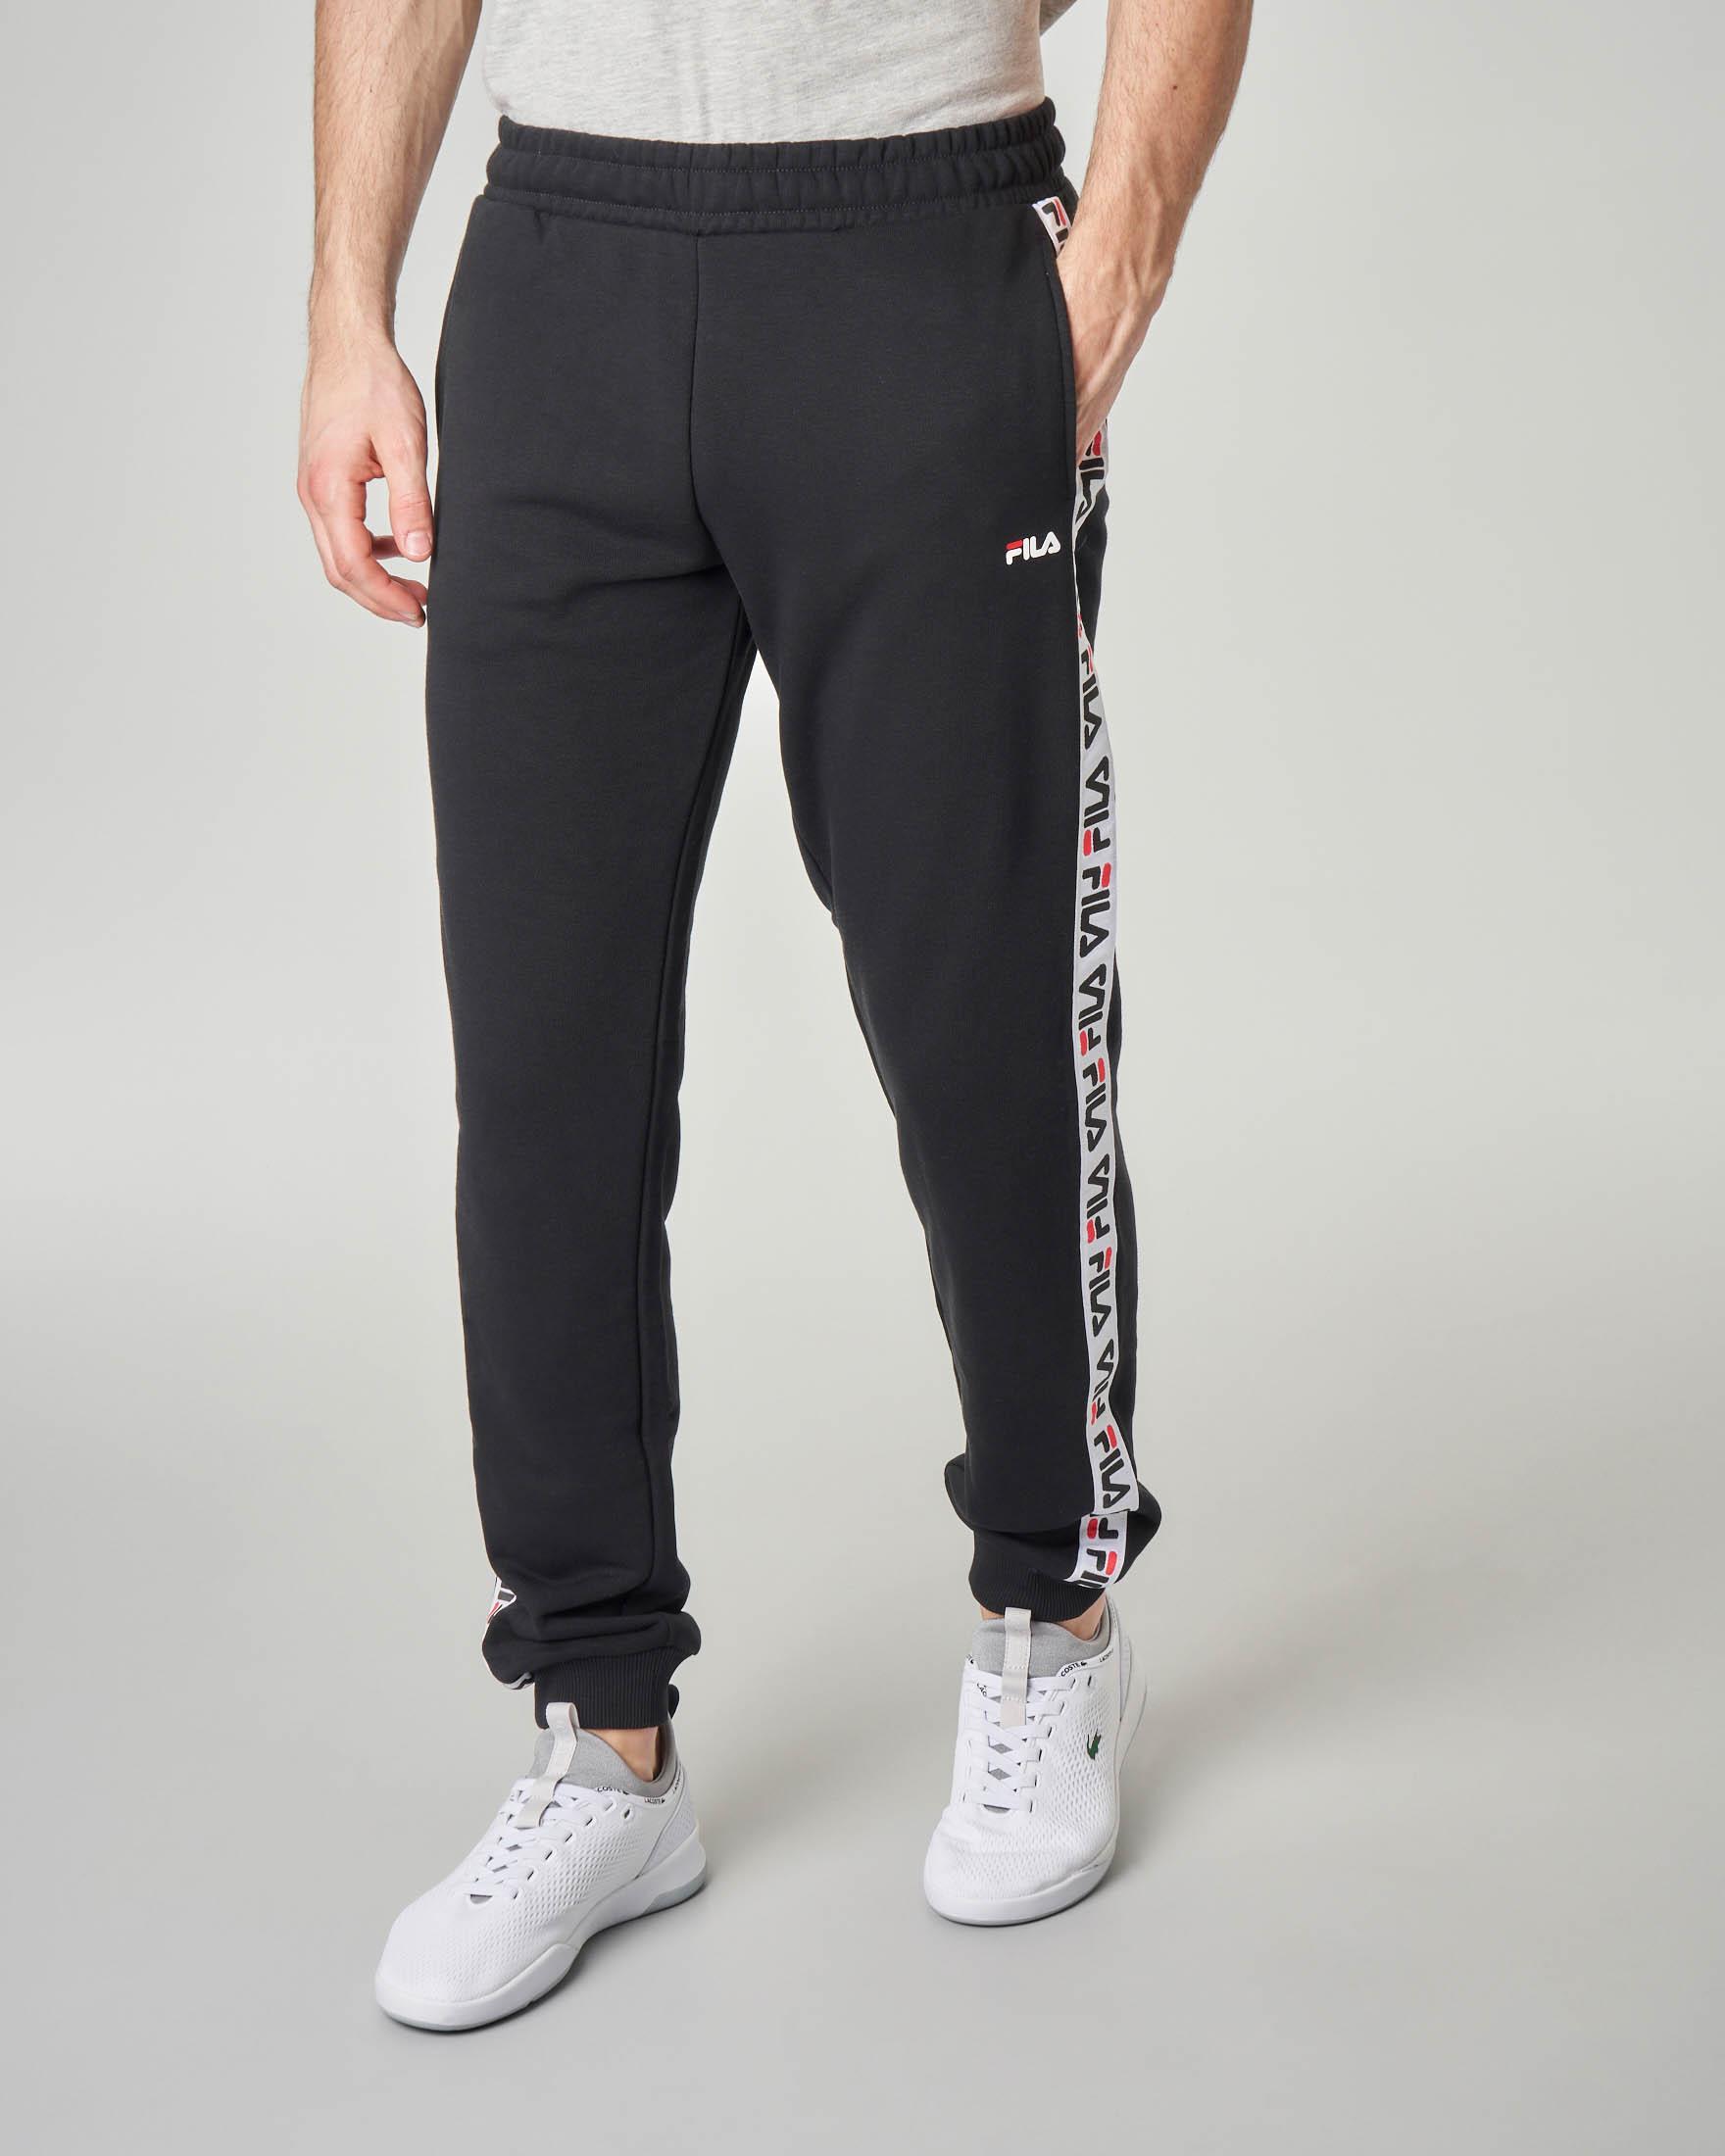 Pantalone nero in felpa con banda logata